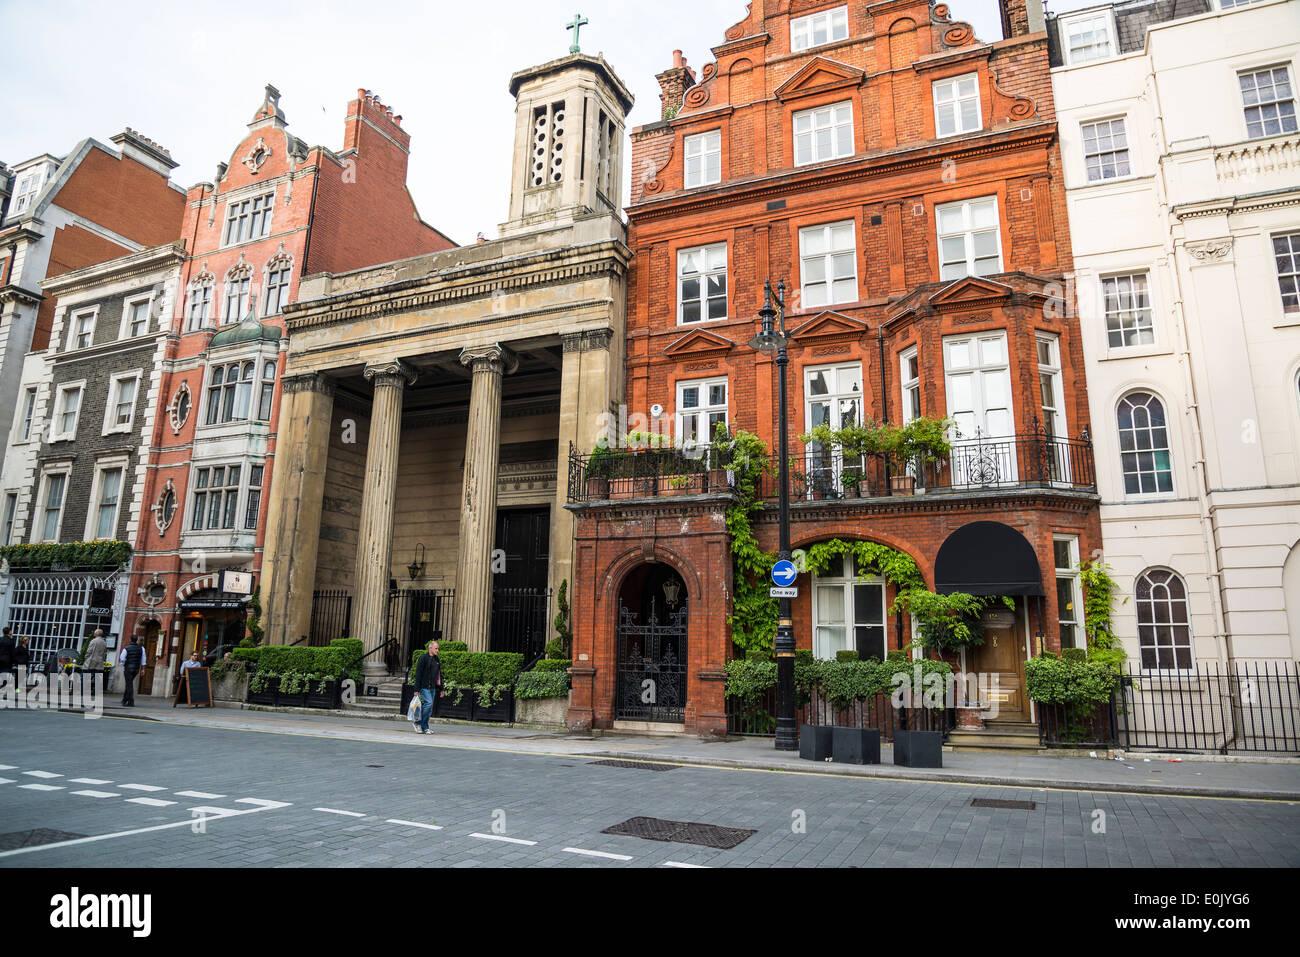 N Audley Street, W1, Mayfair, London, UK - Stock Image